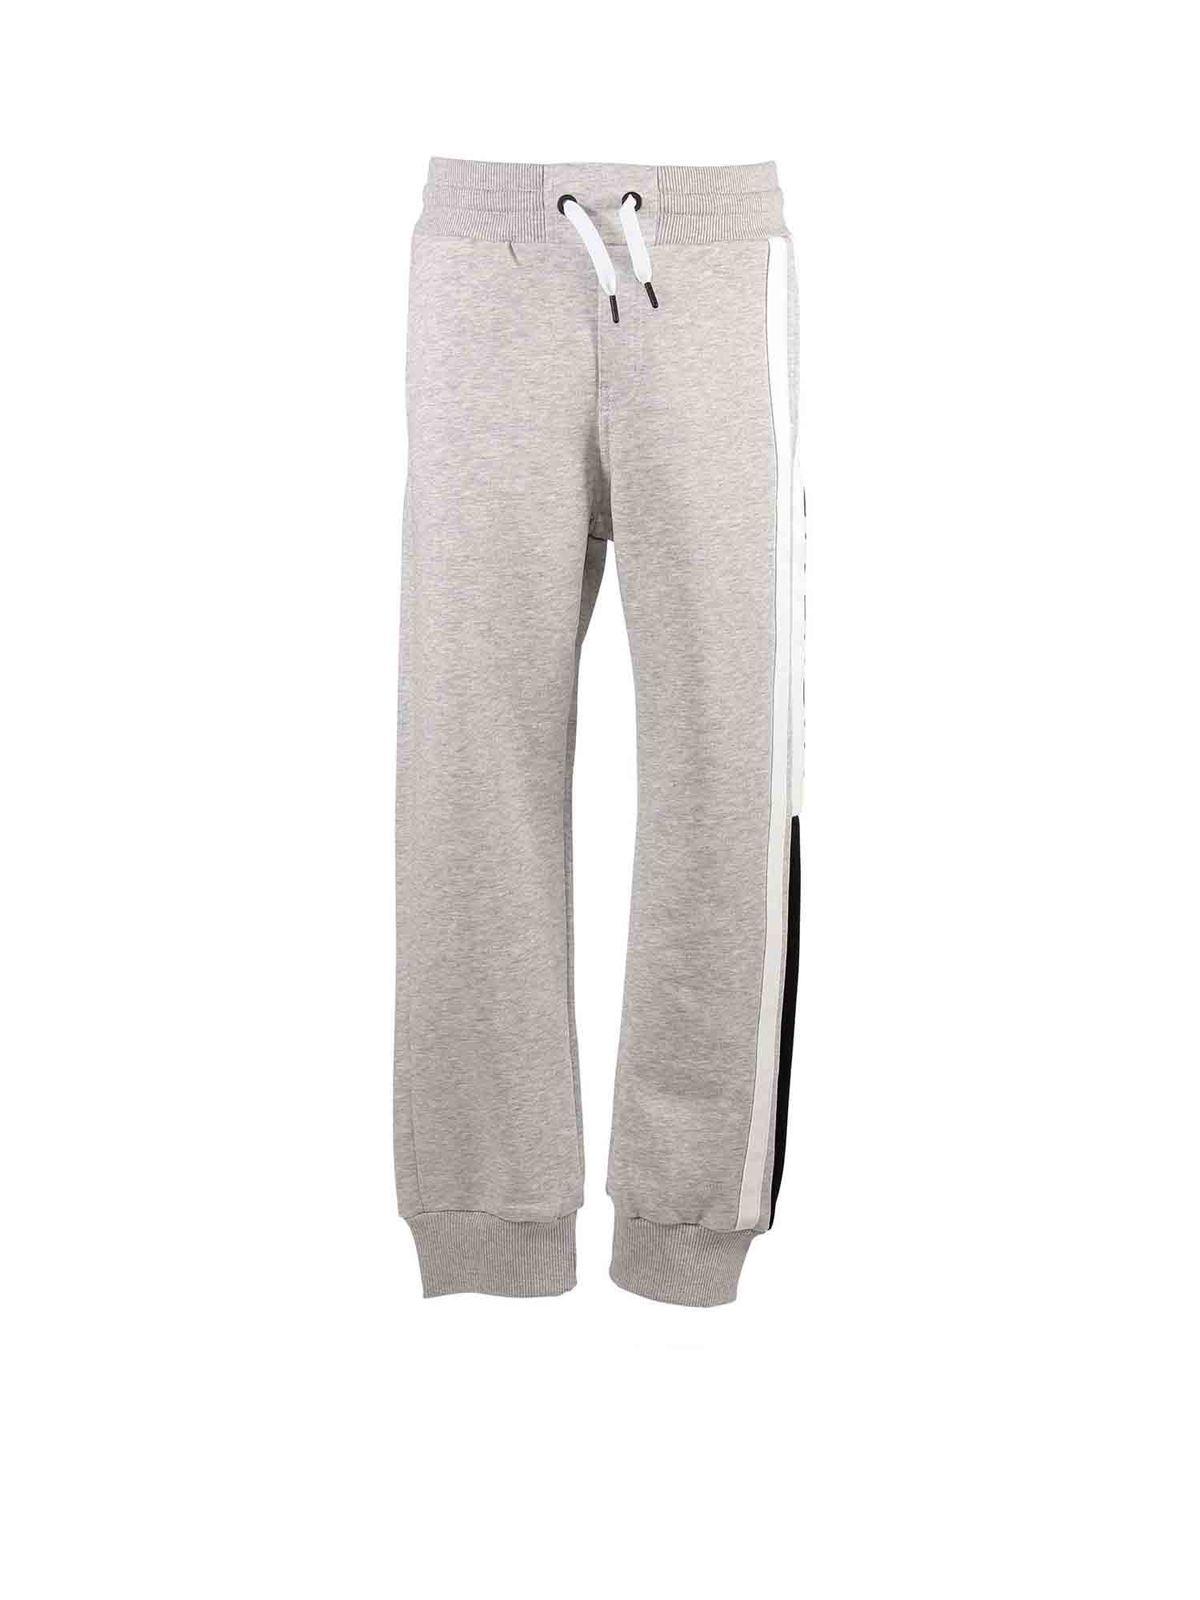 Givenchy Kids' Logo Printed Pants In Melange Grey